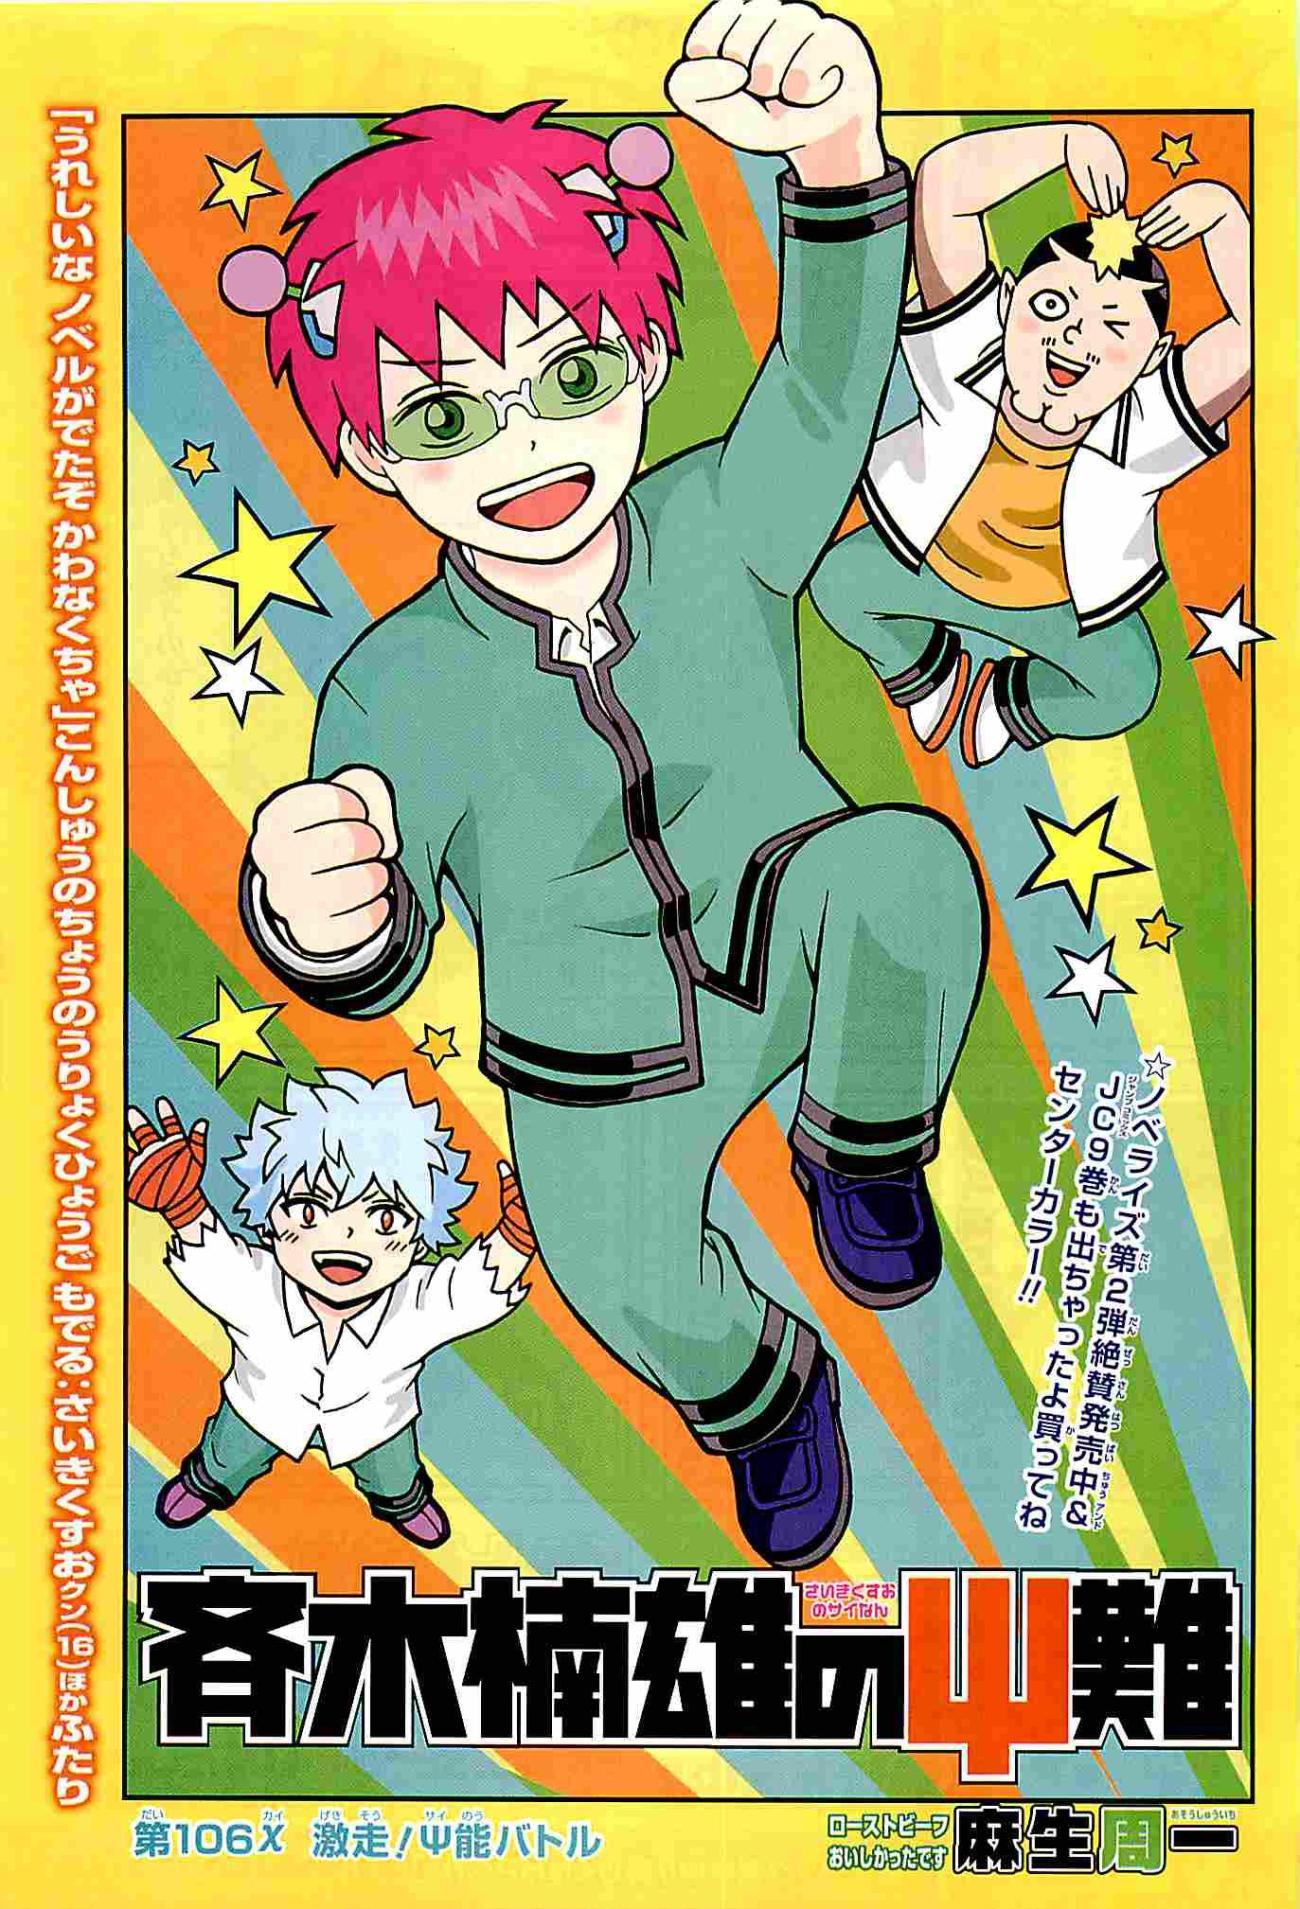 PSI Weekly Shonen Jump 2014 #32